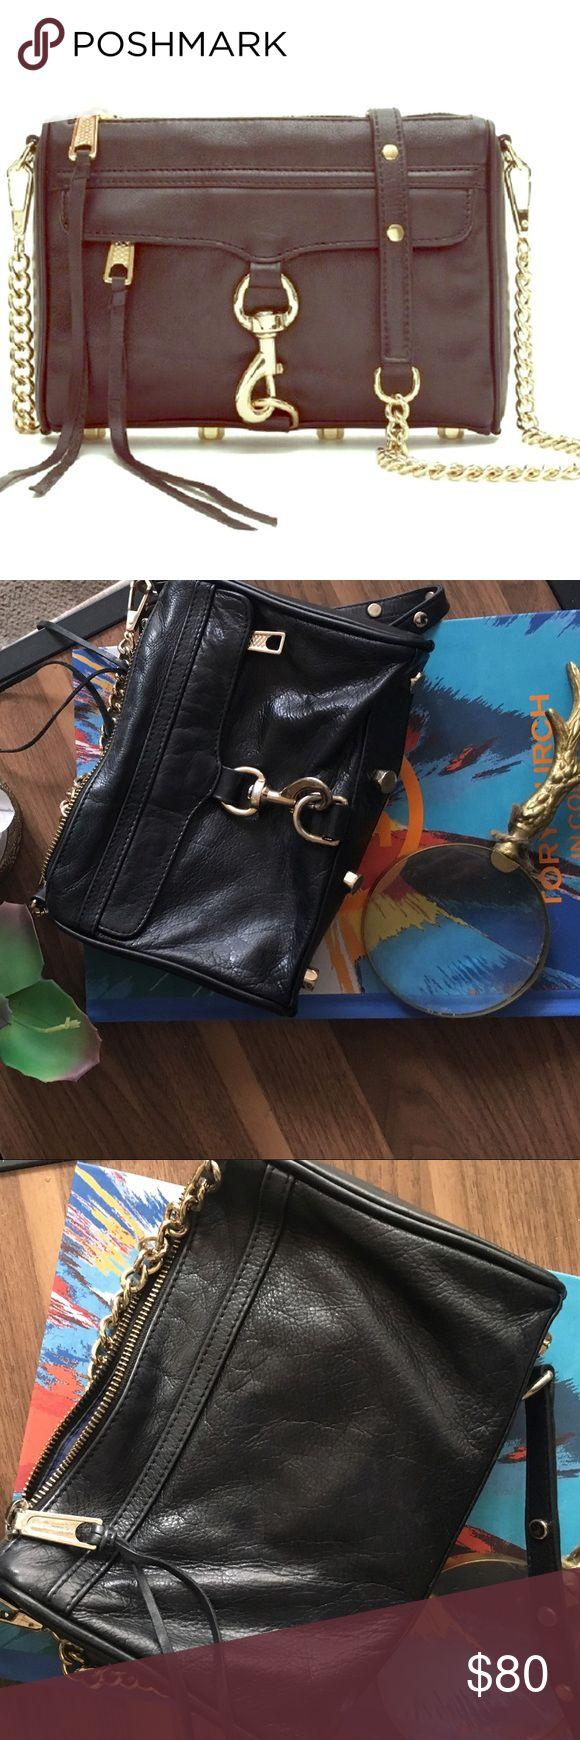 Rebecca Minkoff Black Leather Crossbody Purse Rebecca Minkoff Black Leather Crossbody purse with gold embellishments. *Authentic* Rebecca Minkoff Bags Crossbody Bags